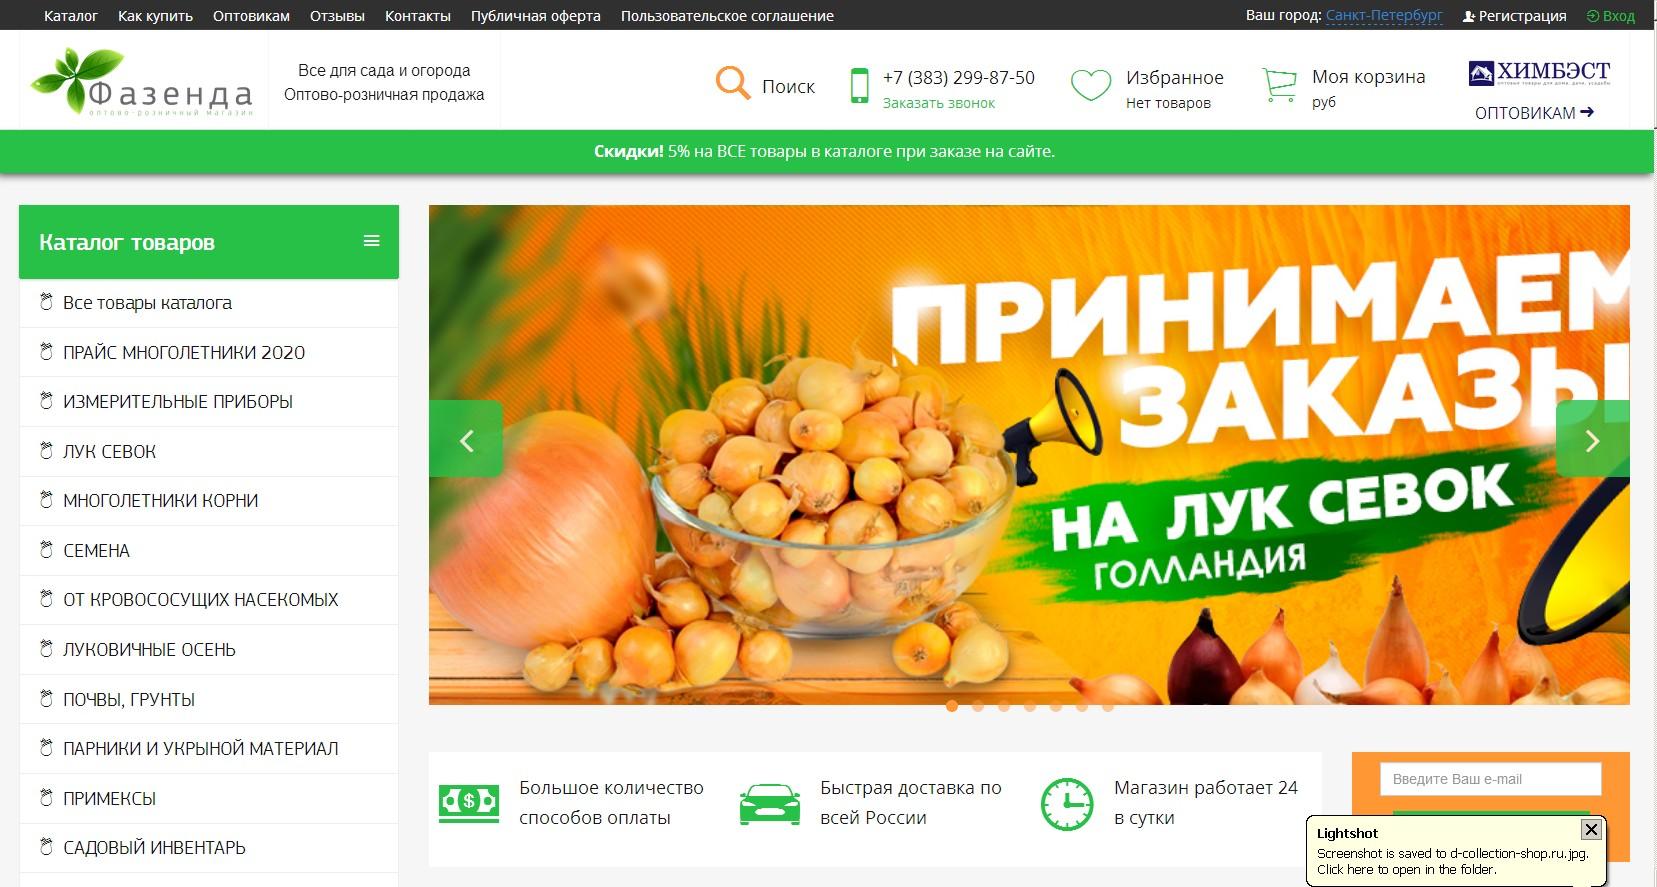 Скриншот интернет-магазина fazenda.shop